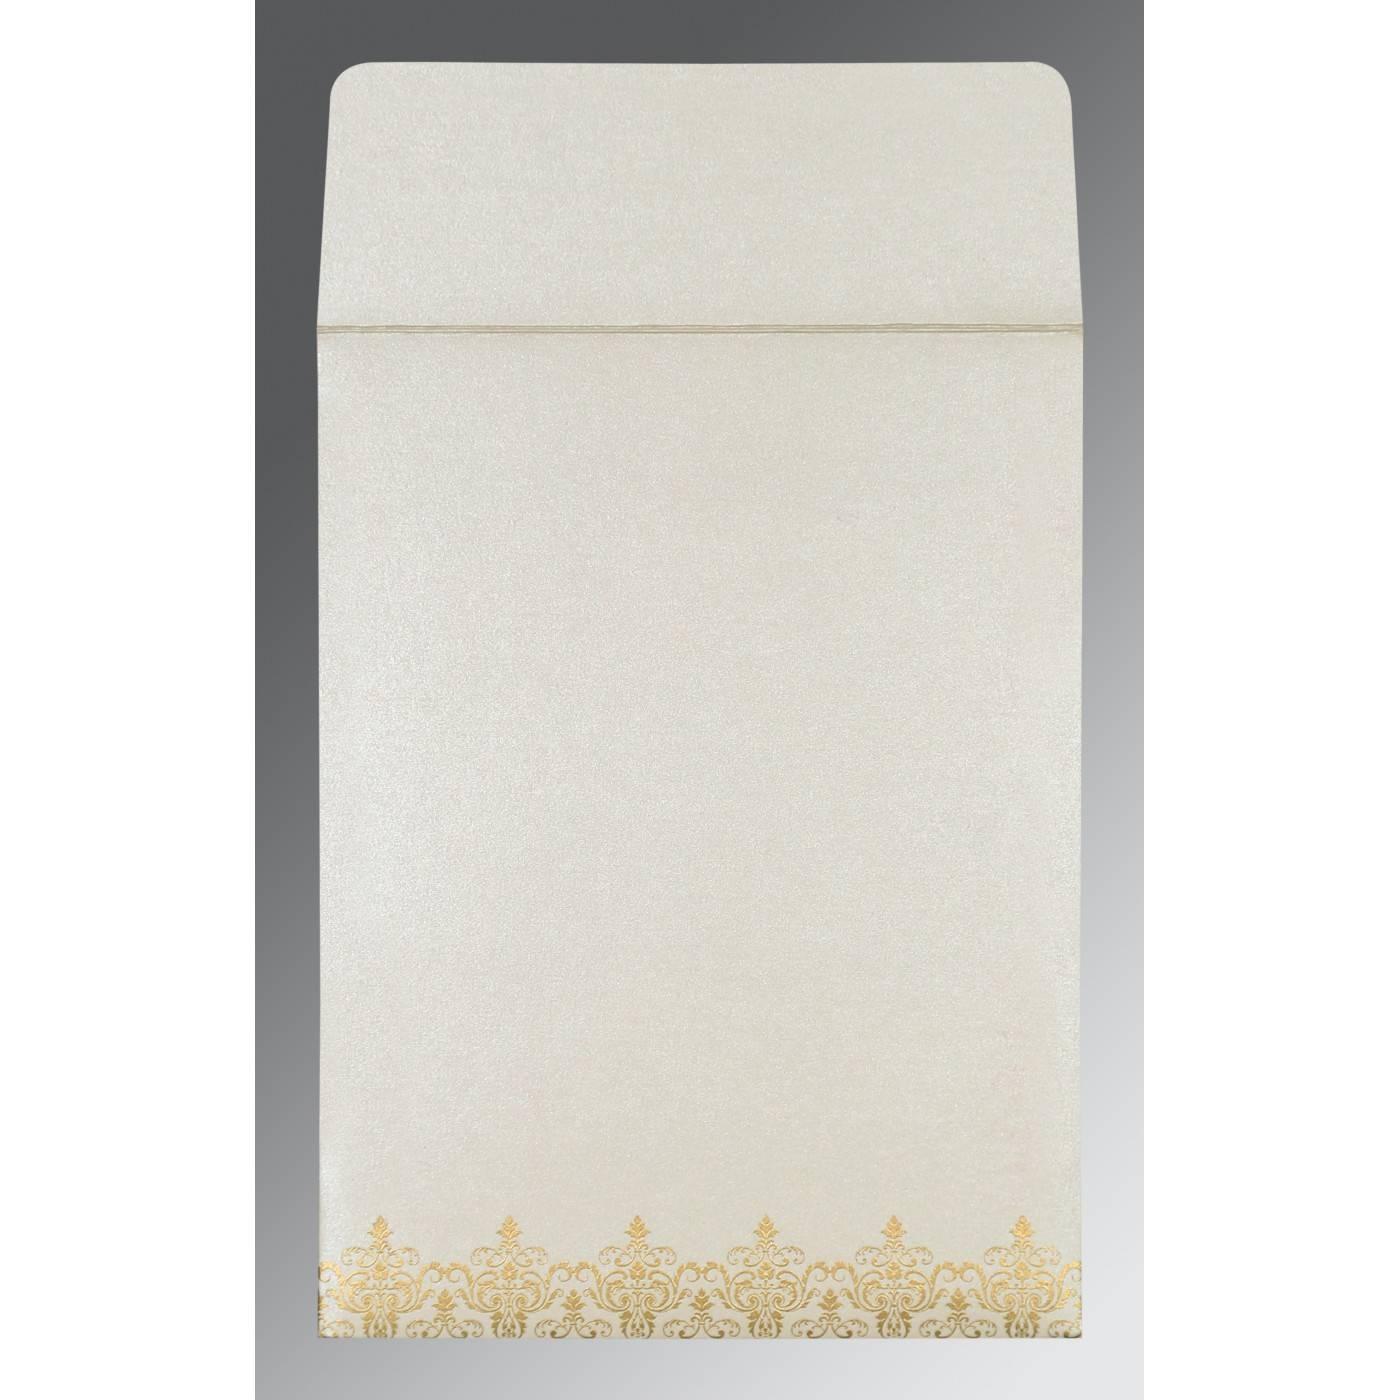 OFF-WHITE SHIMMERY SCREEN PRINTED WEDDING CARD : CRU-8244B - IndianWeddingCards